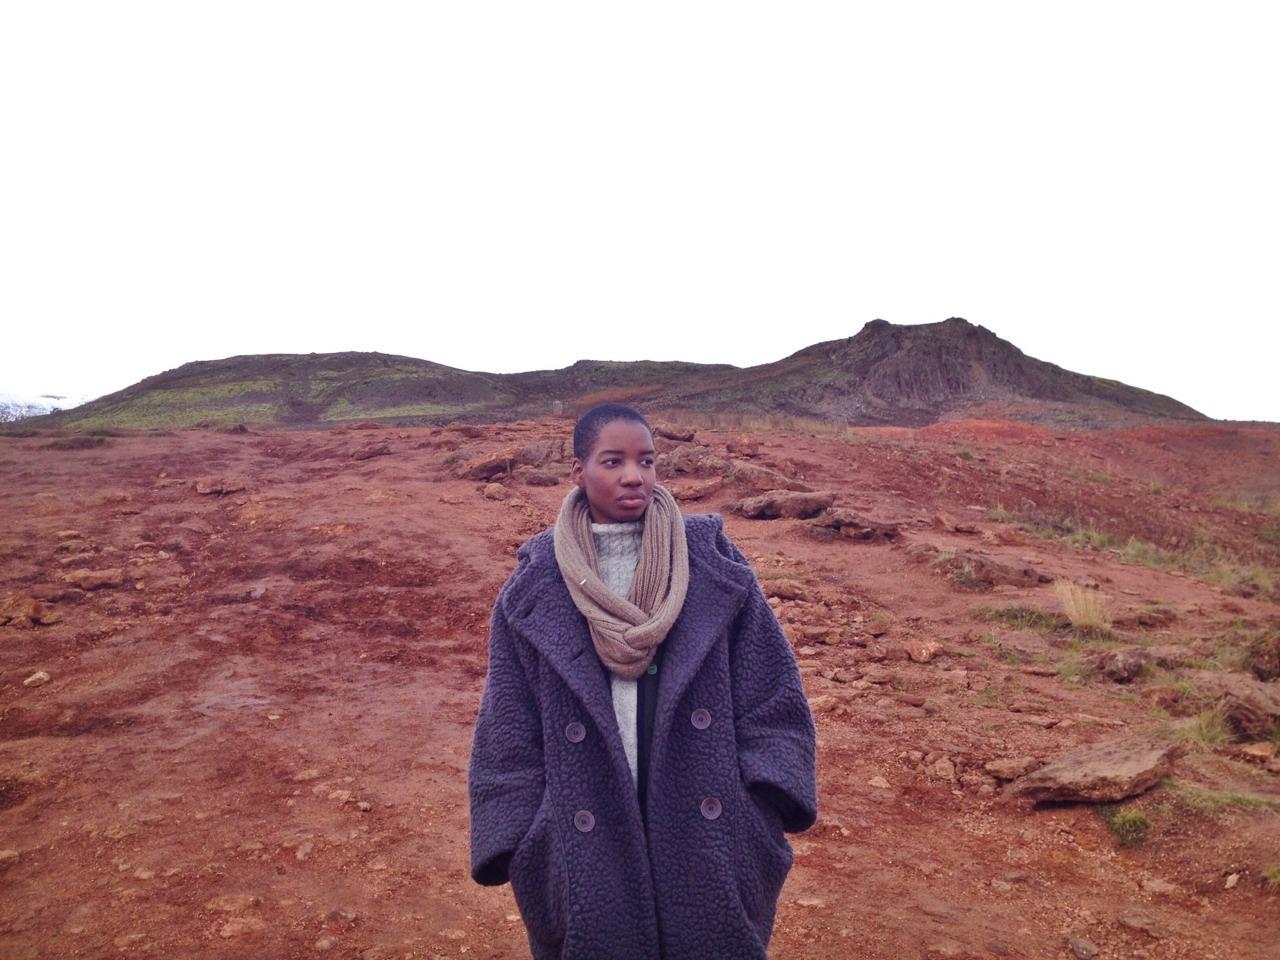 Me in Þingvellir National Park, Iceland (2013)